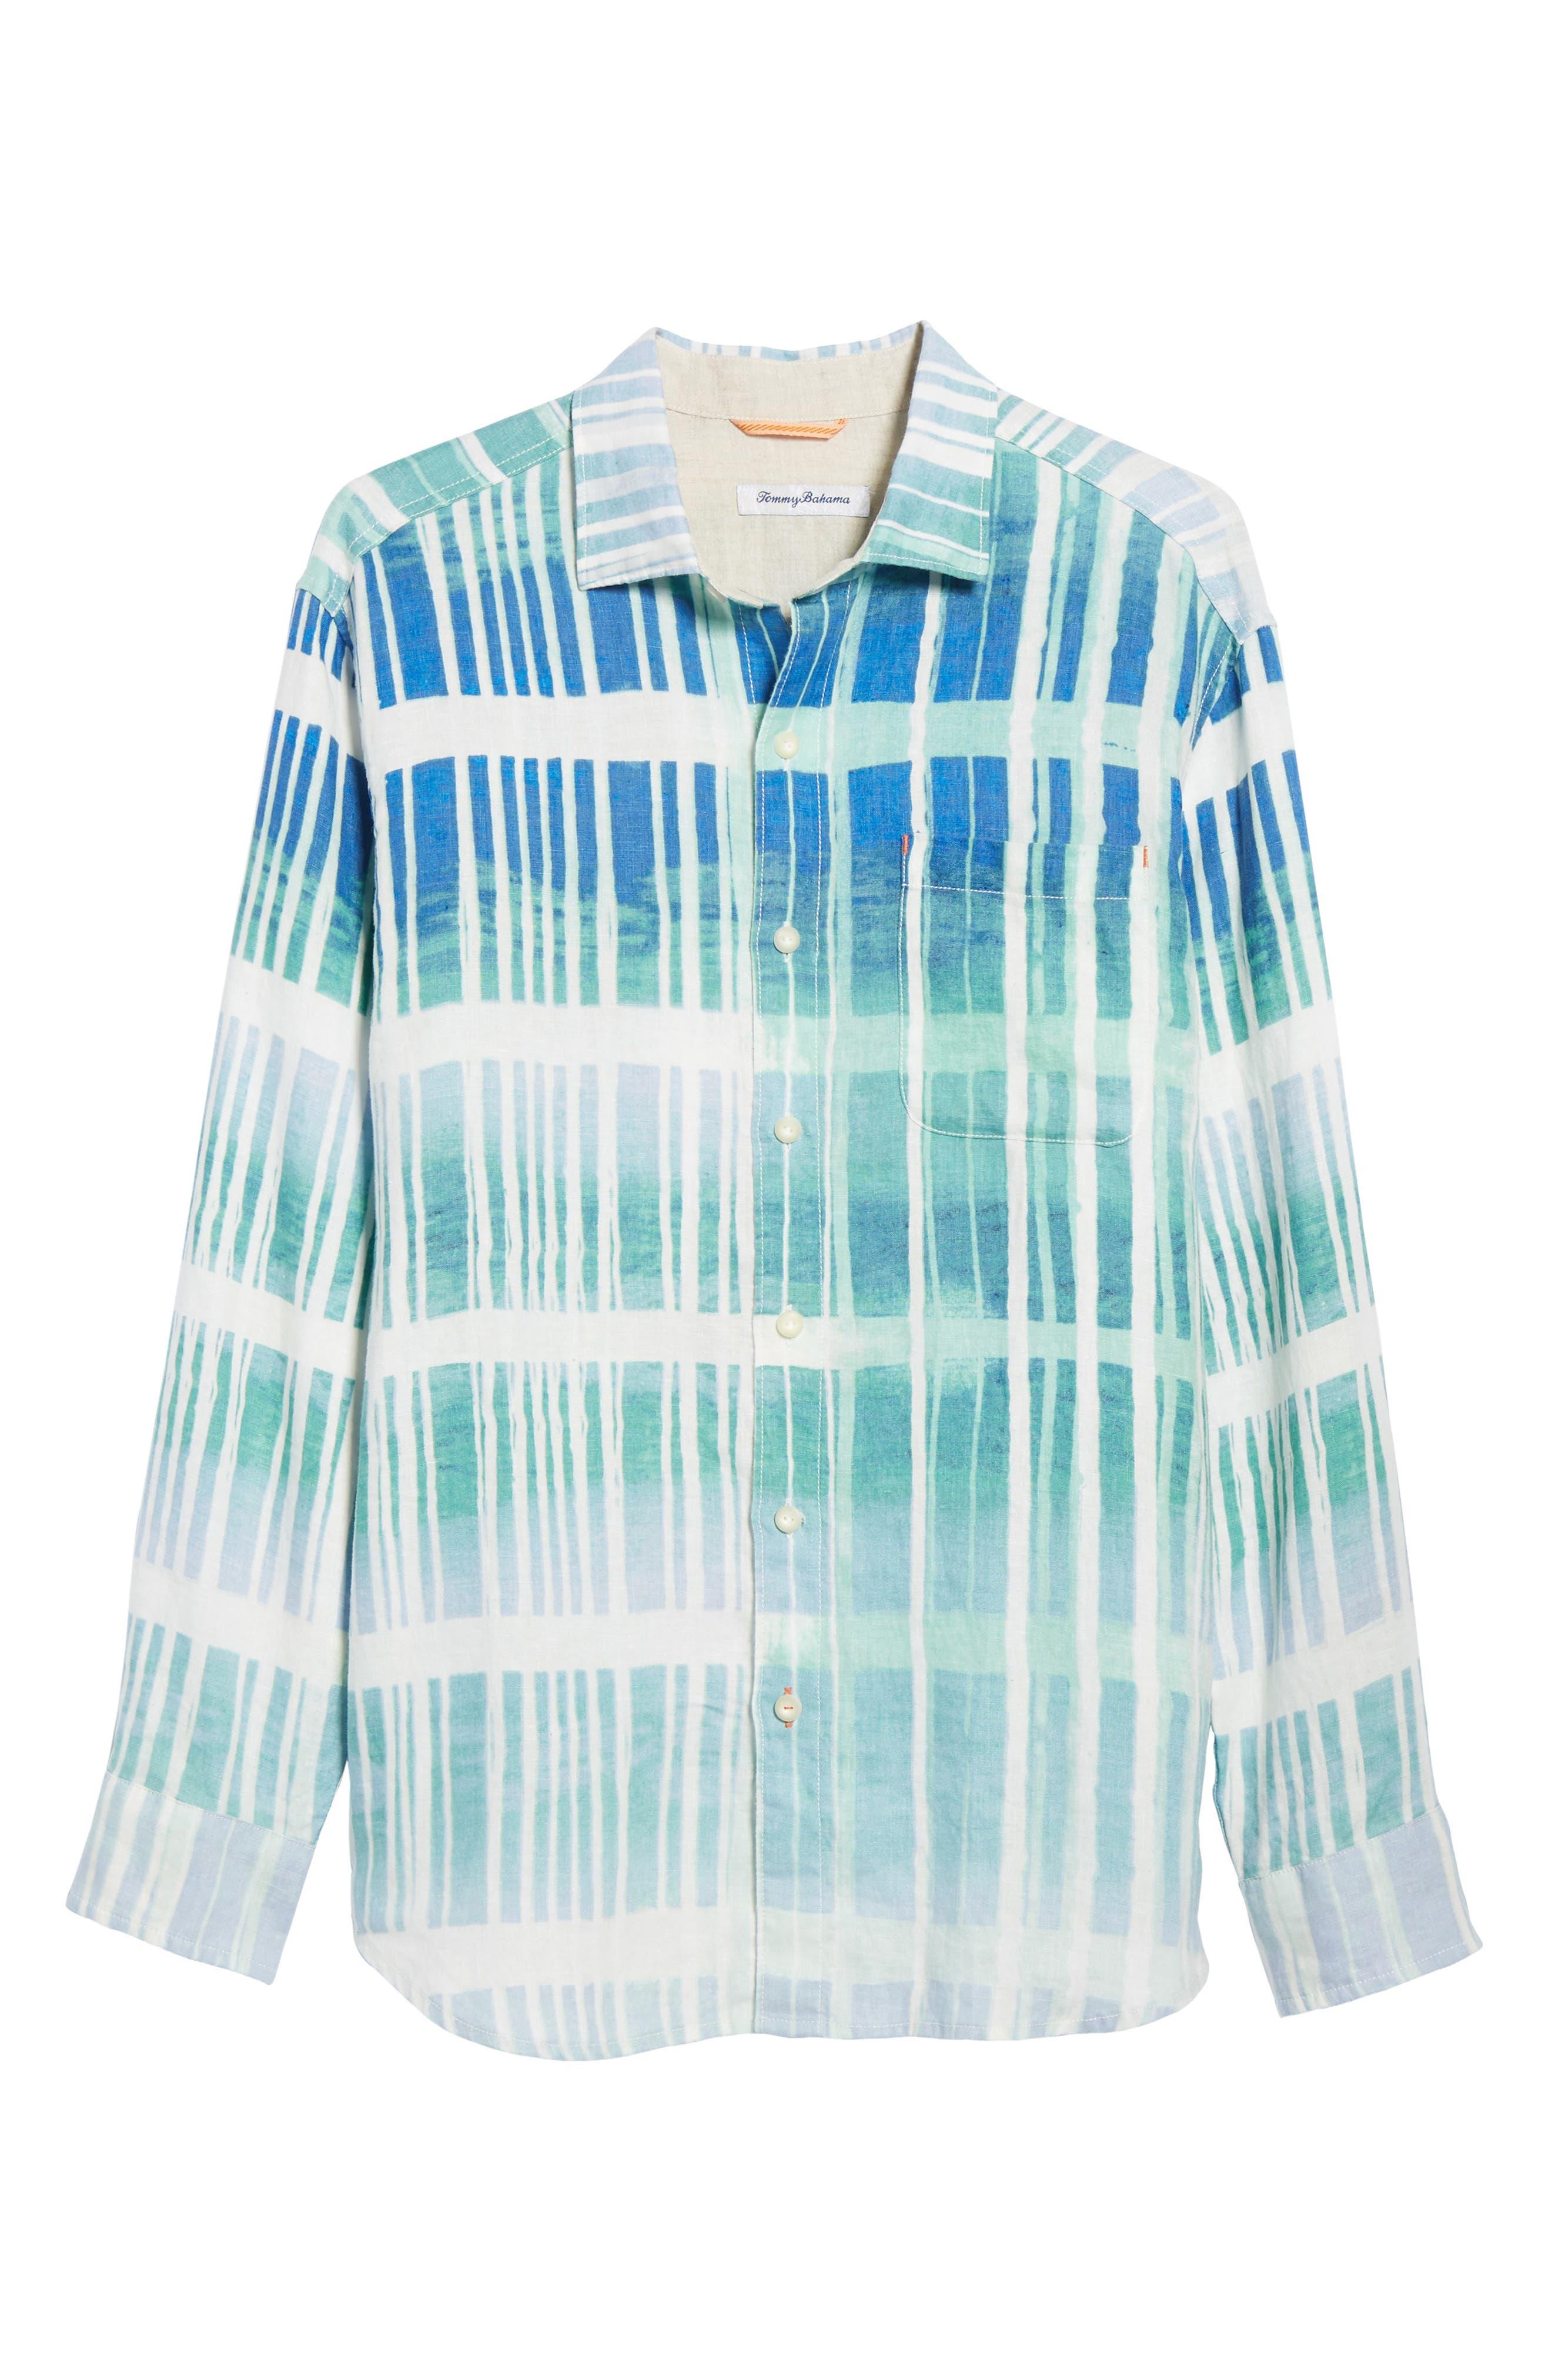 Okeechobee Ombré Breezer Sport Shirt,                             Alternate thumbnail 6, color,                             Santorini Blue